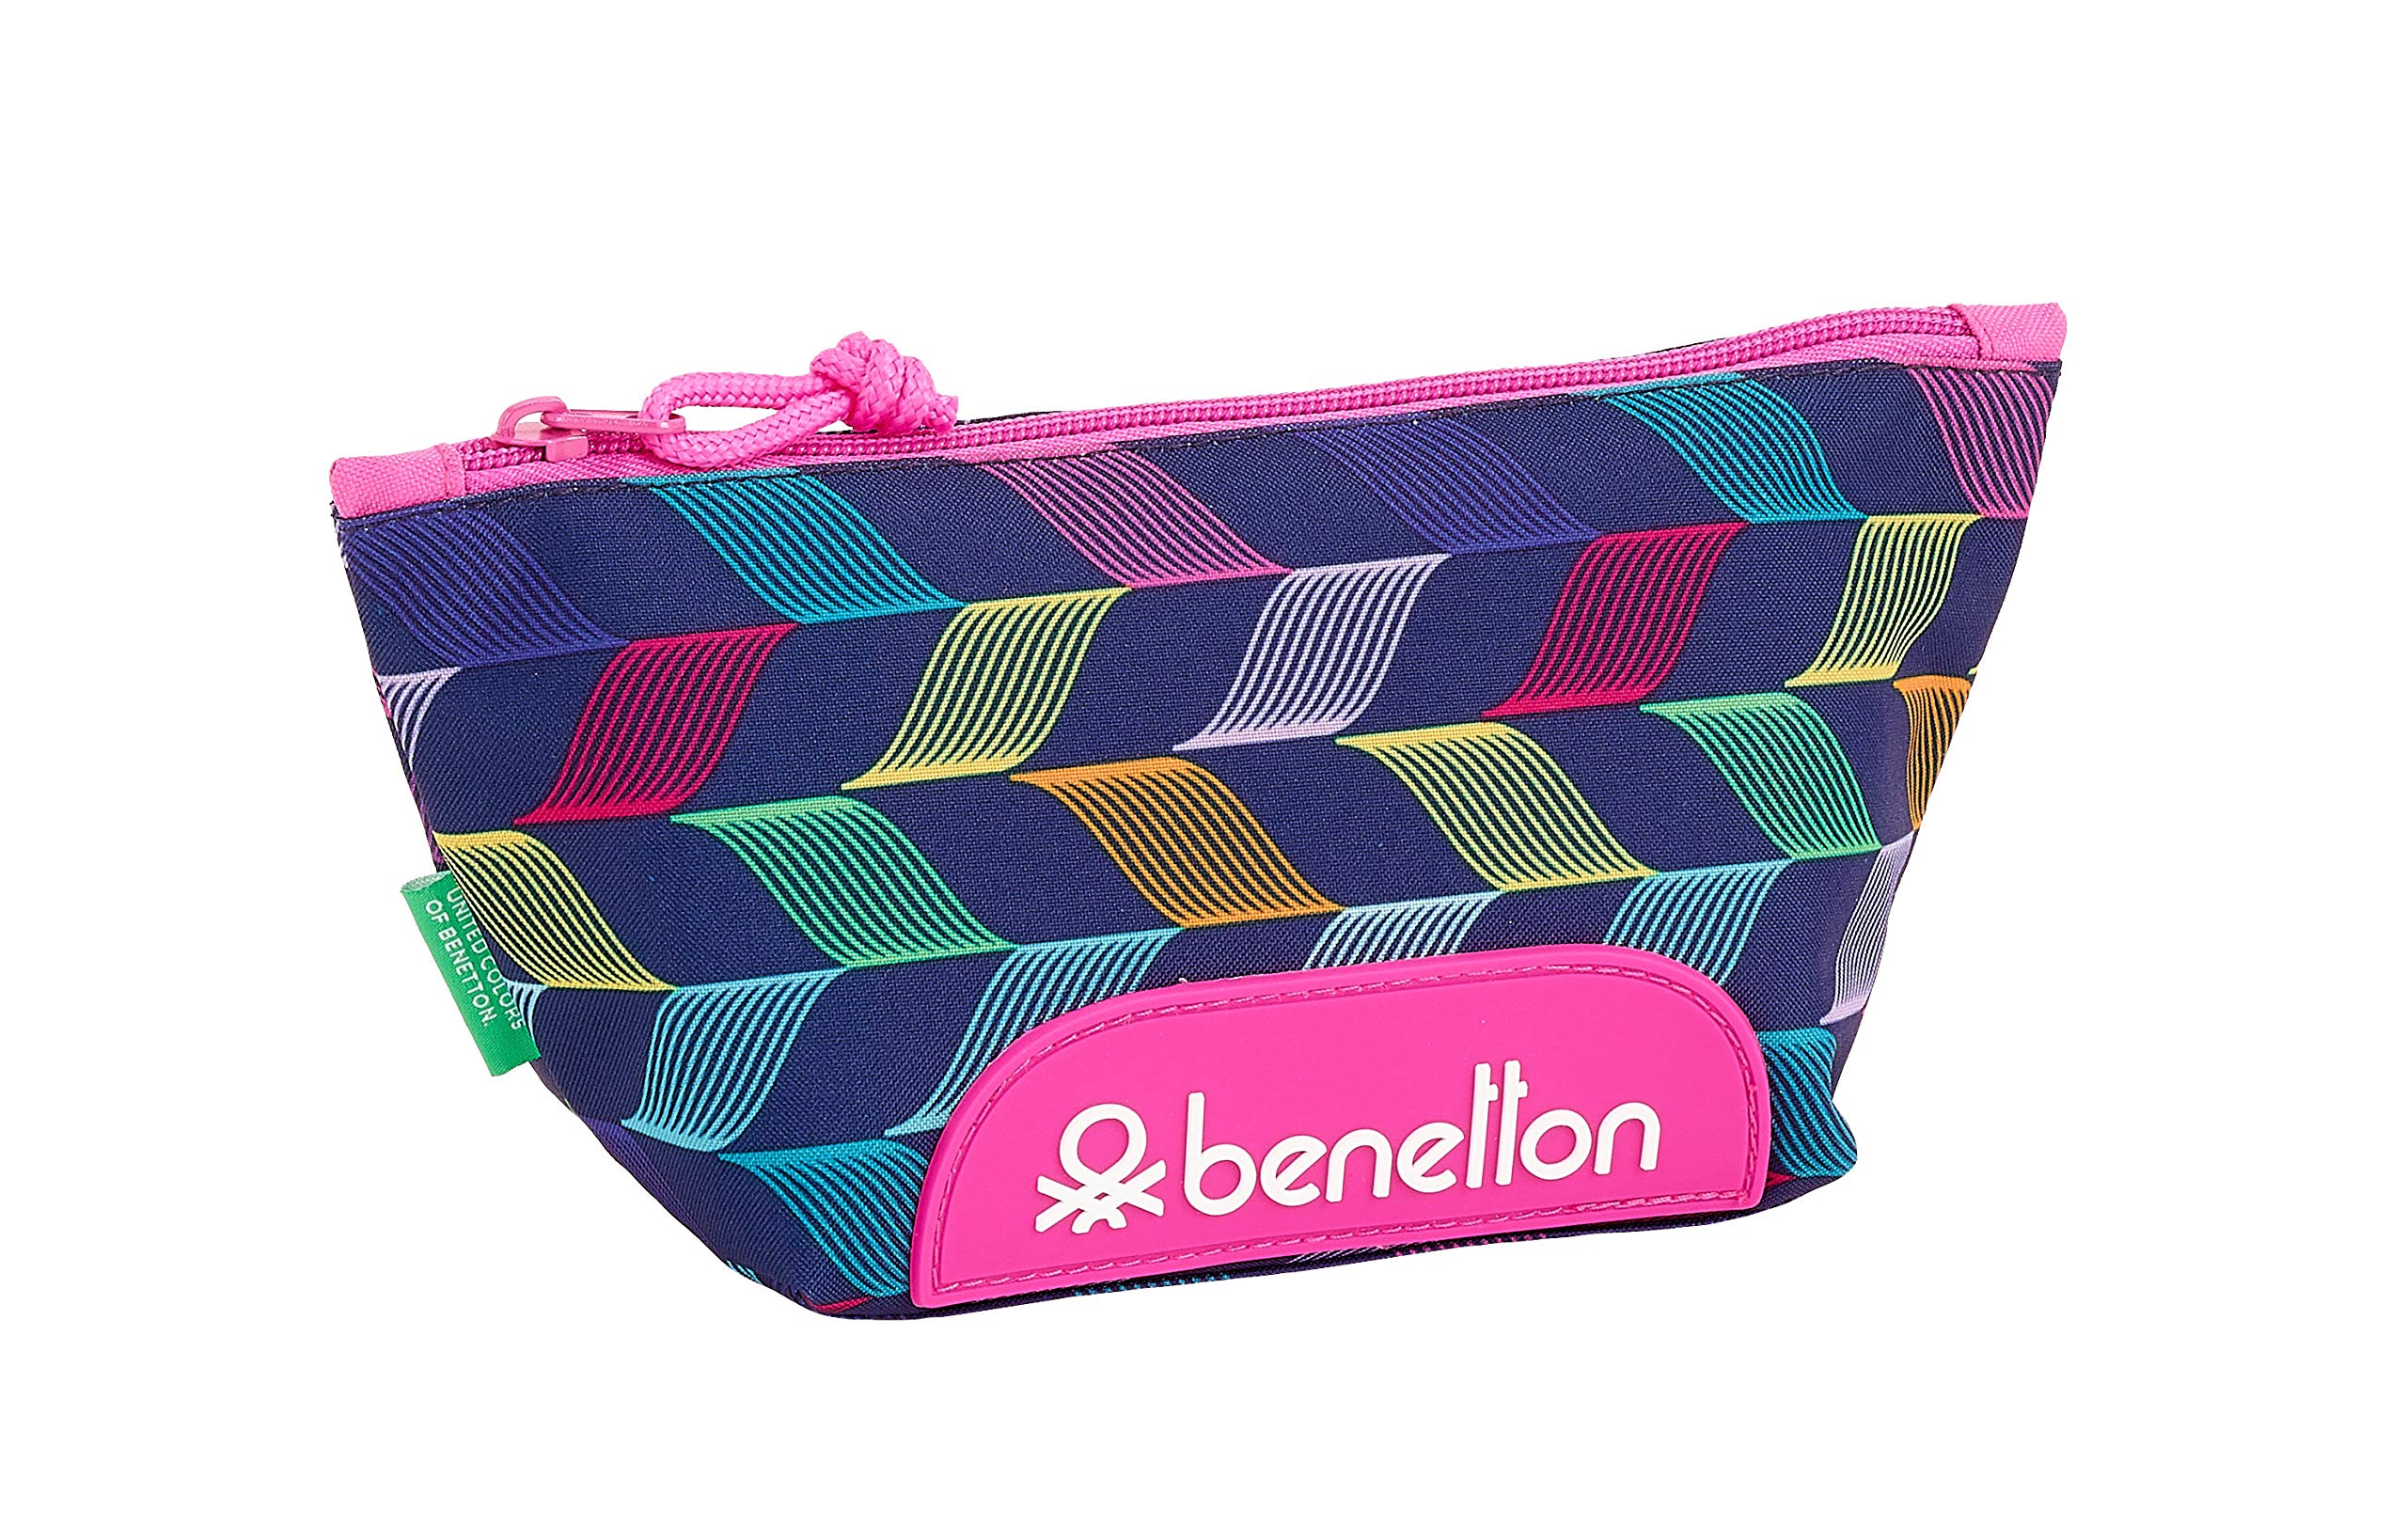 Benetton «Ondas» Oficial Mochila Escolar Infantil Porta Maquillaje 230x80x120mm